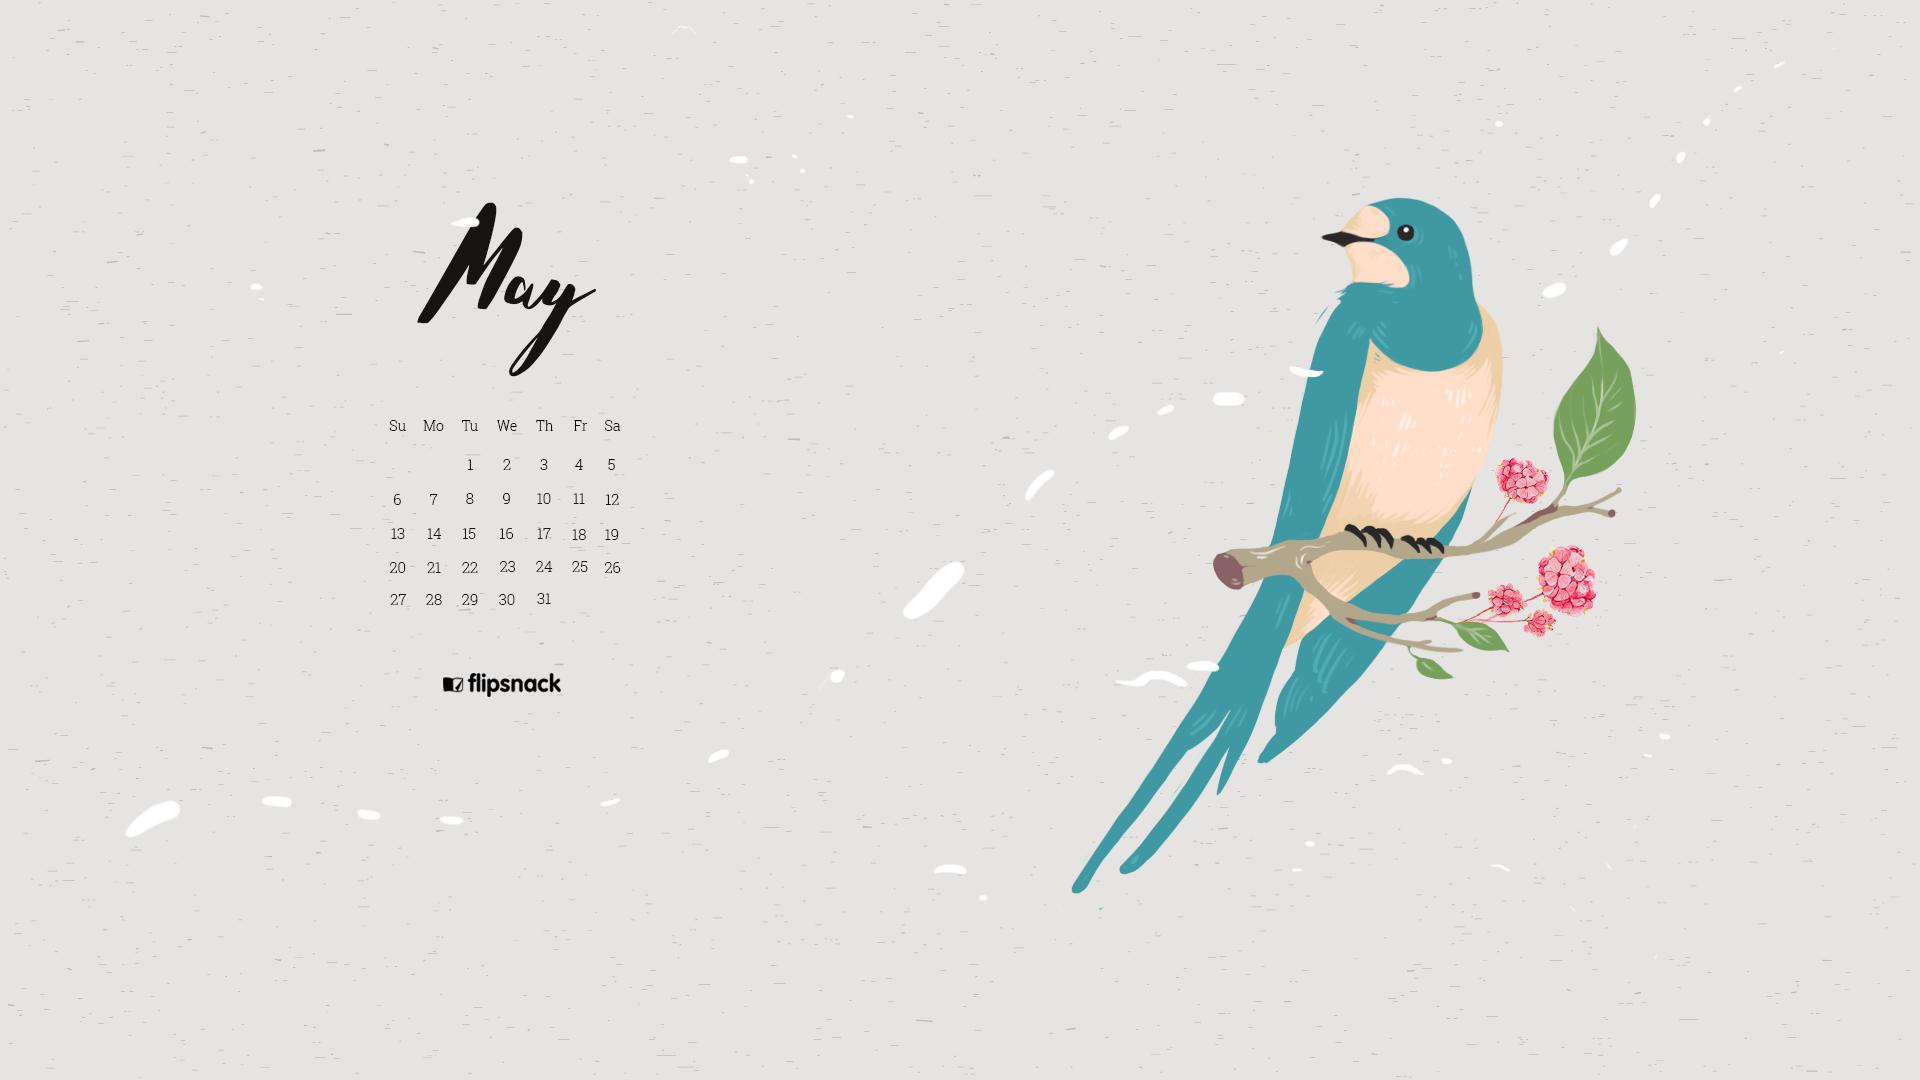 May 2018 Calendar Wallpaper For Desktop Smartphone